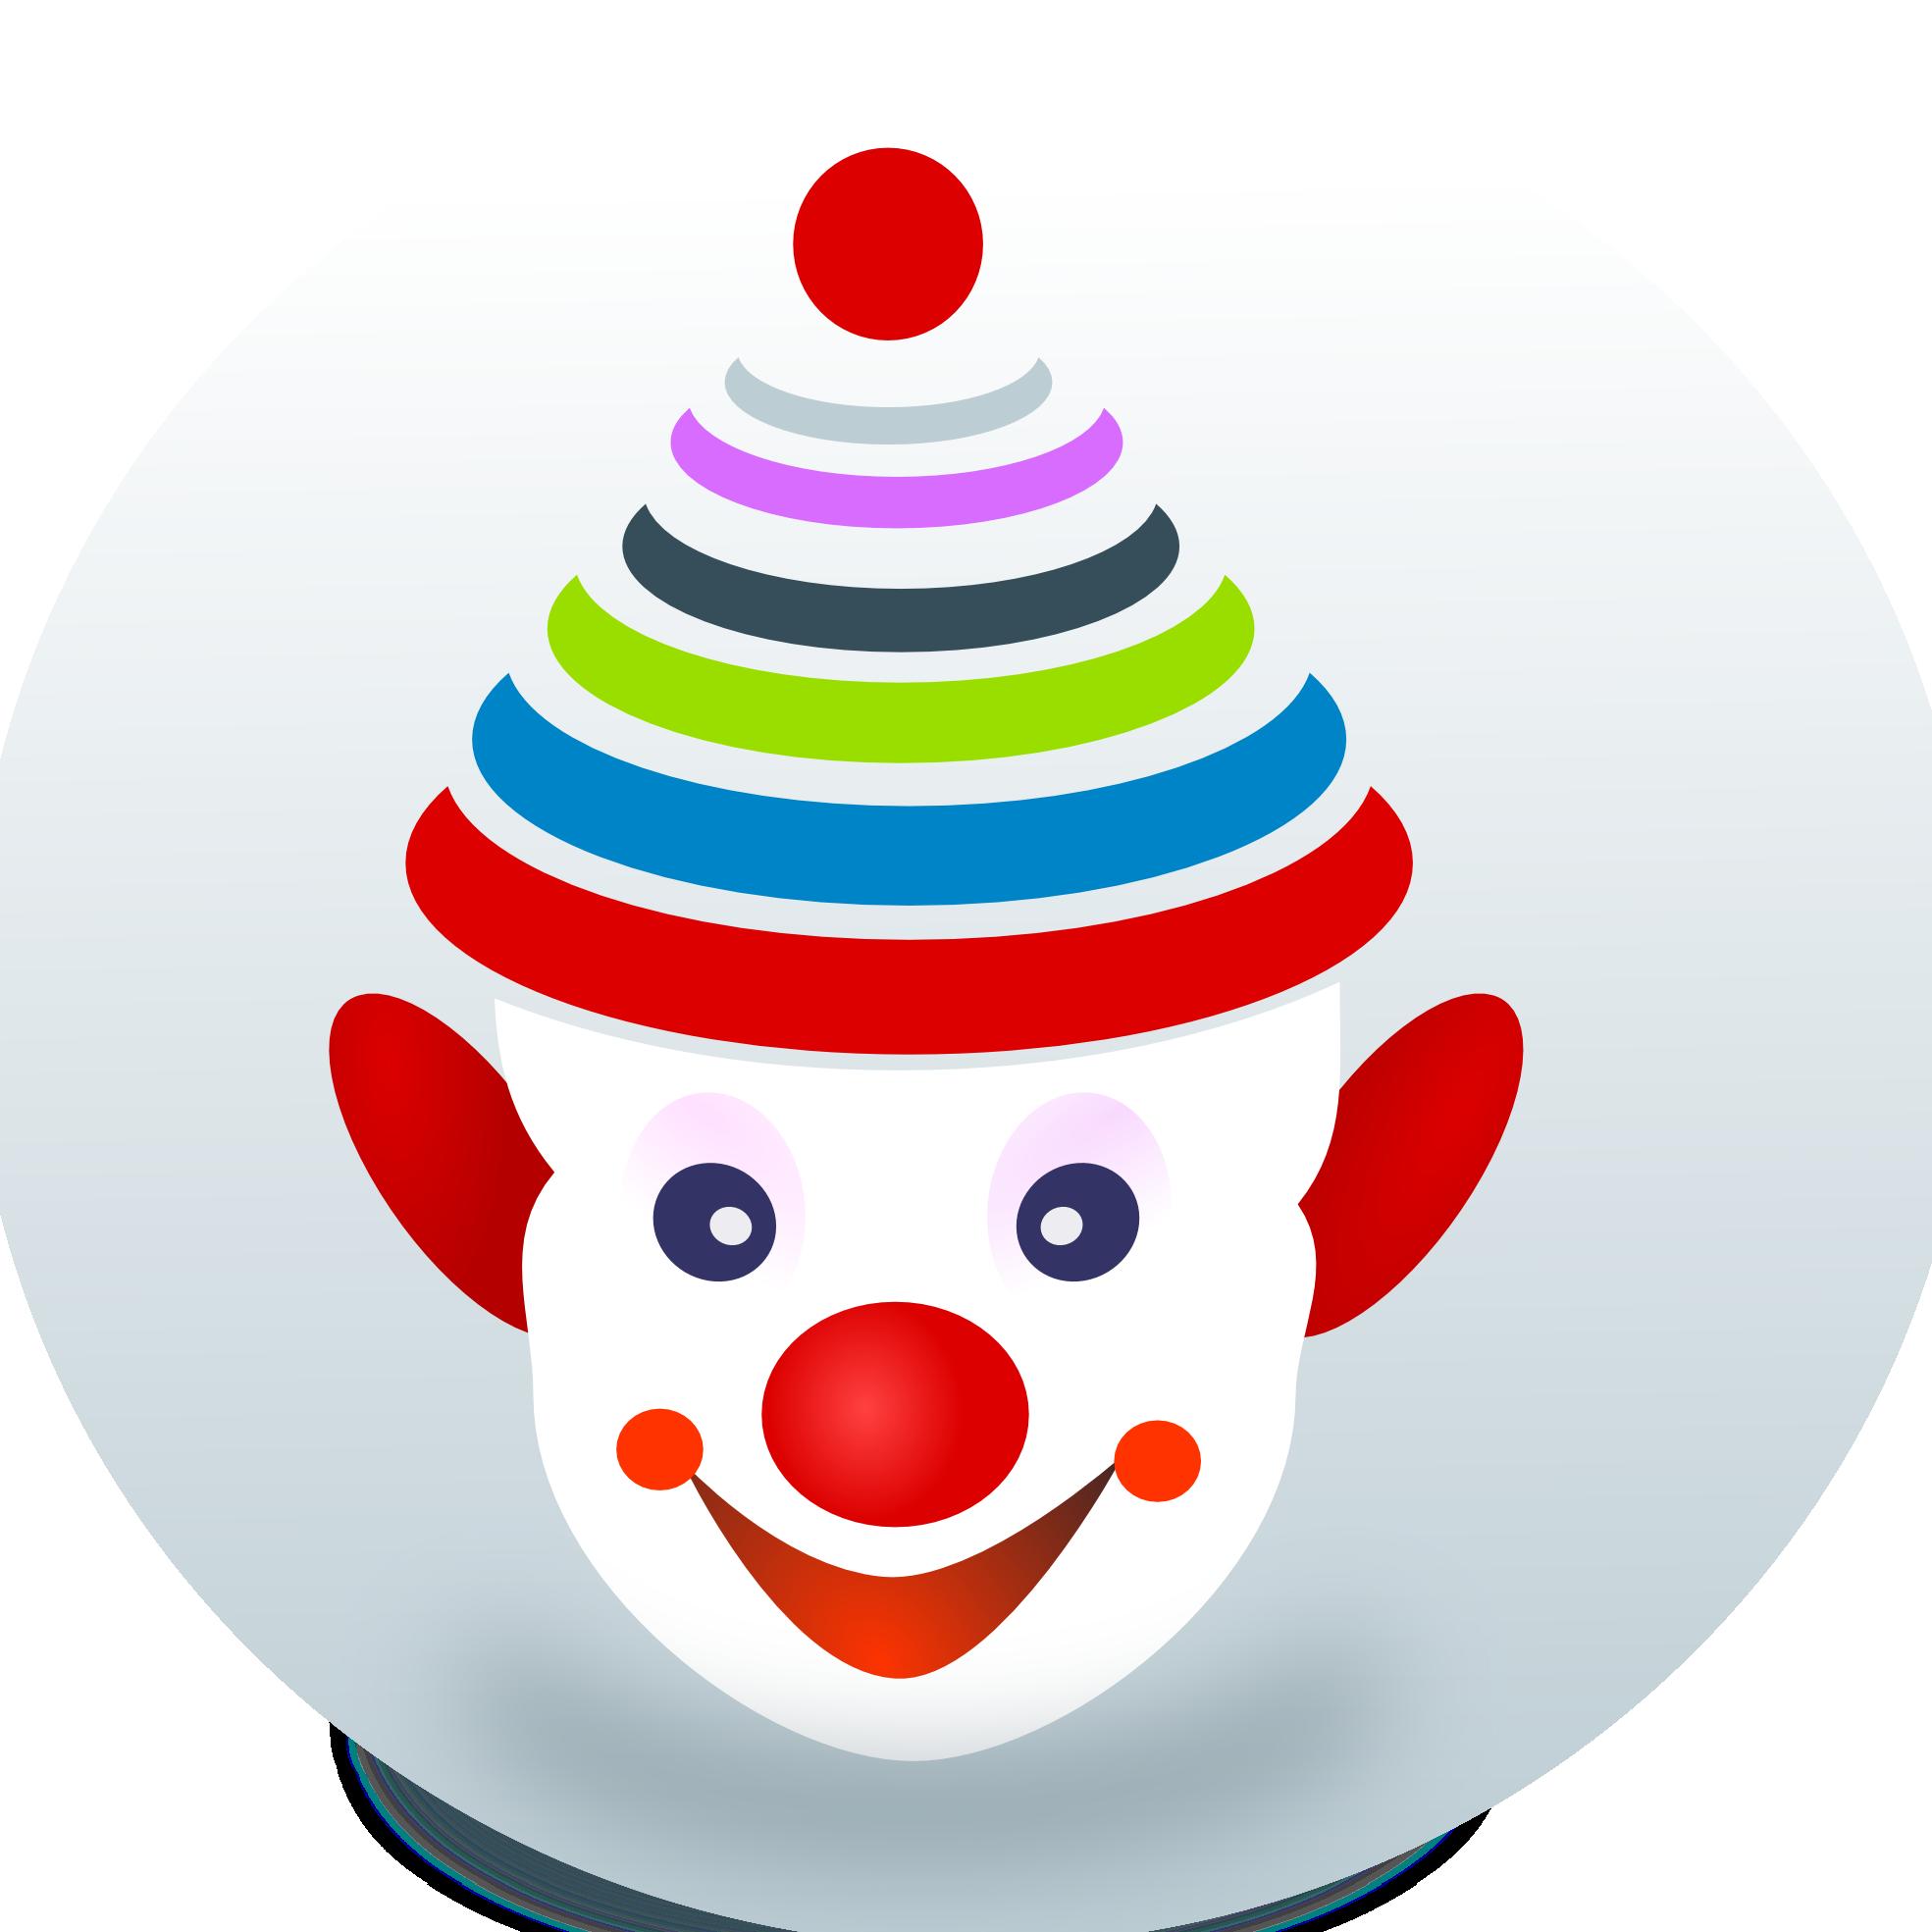 Joker clip art freeuse download Joker clip art - ClipartFest freeuse download